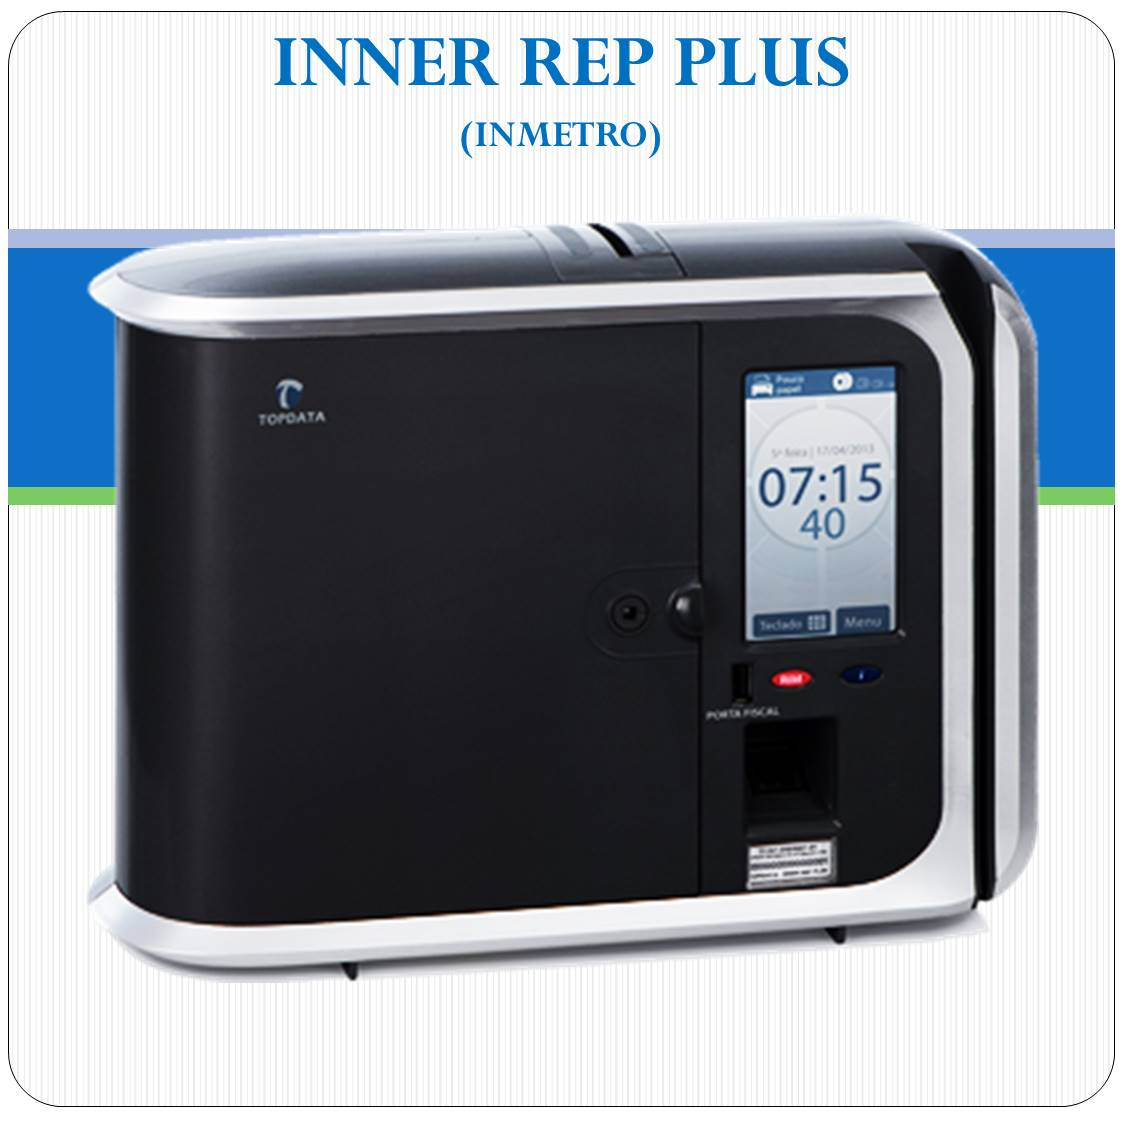 INNER REP PLUS - Homologado Inmetro